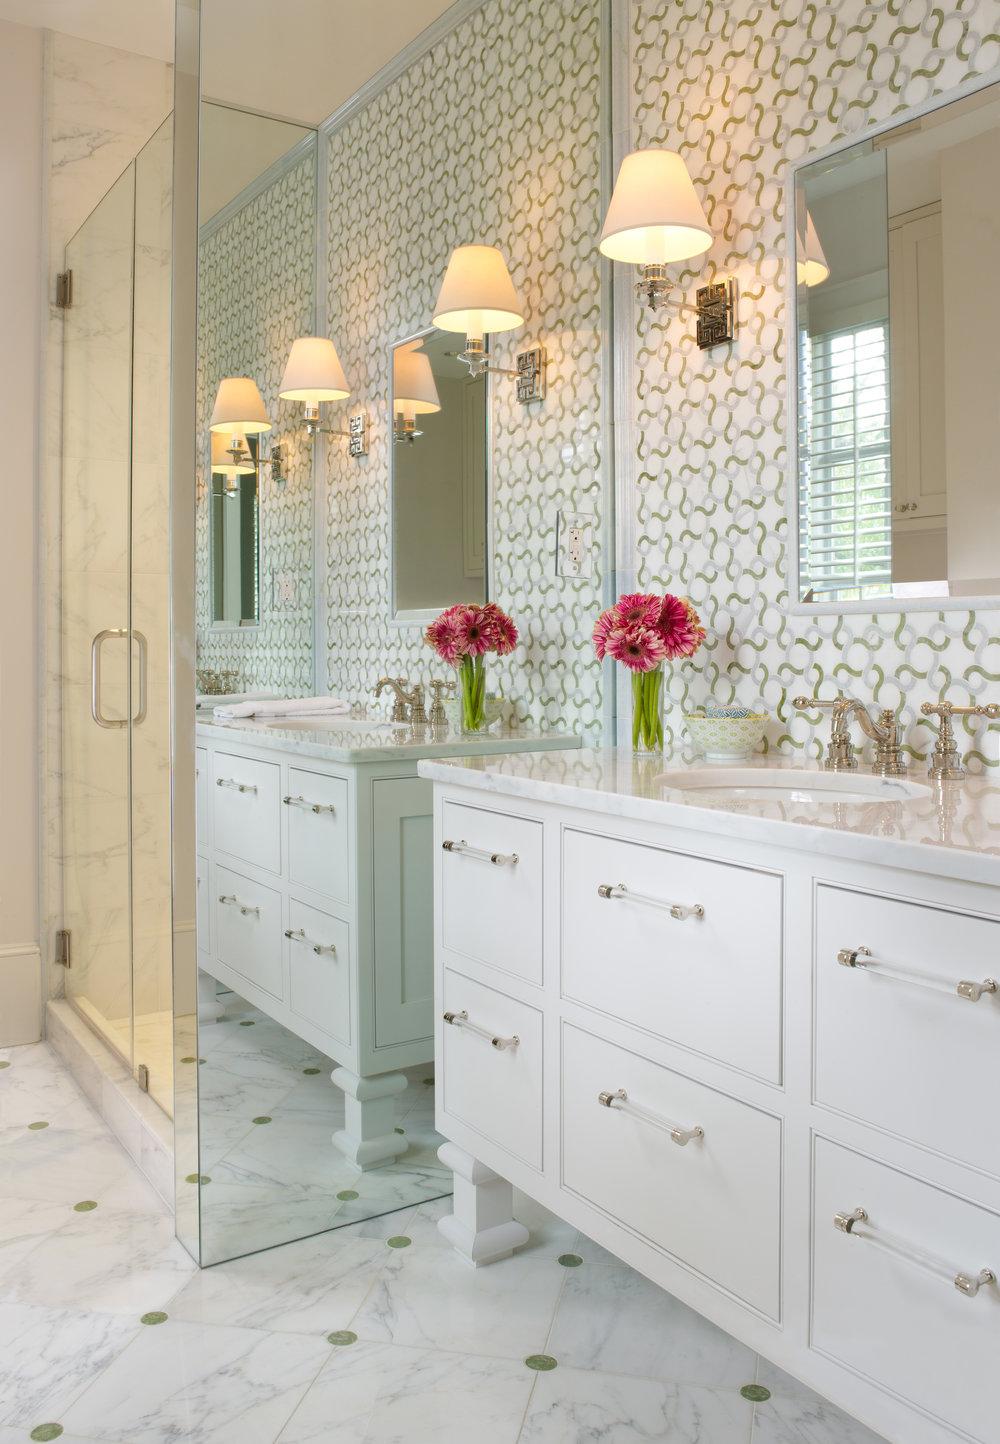 Alexandria, Virginia bath design by SCW Interiors.